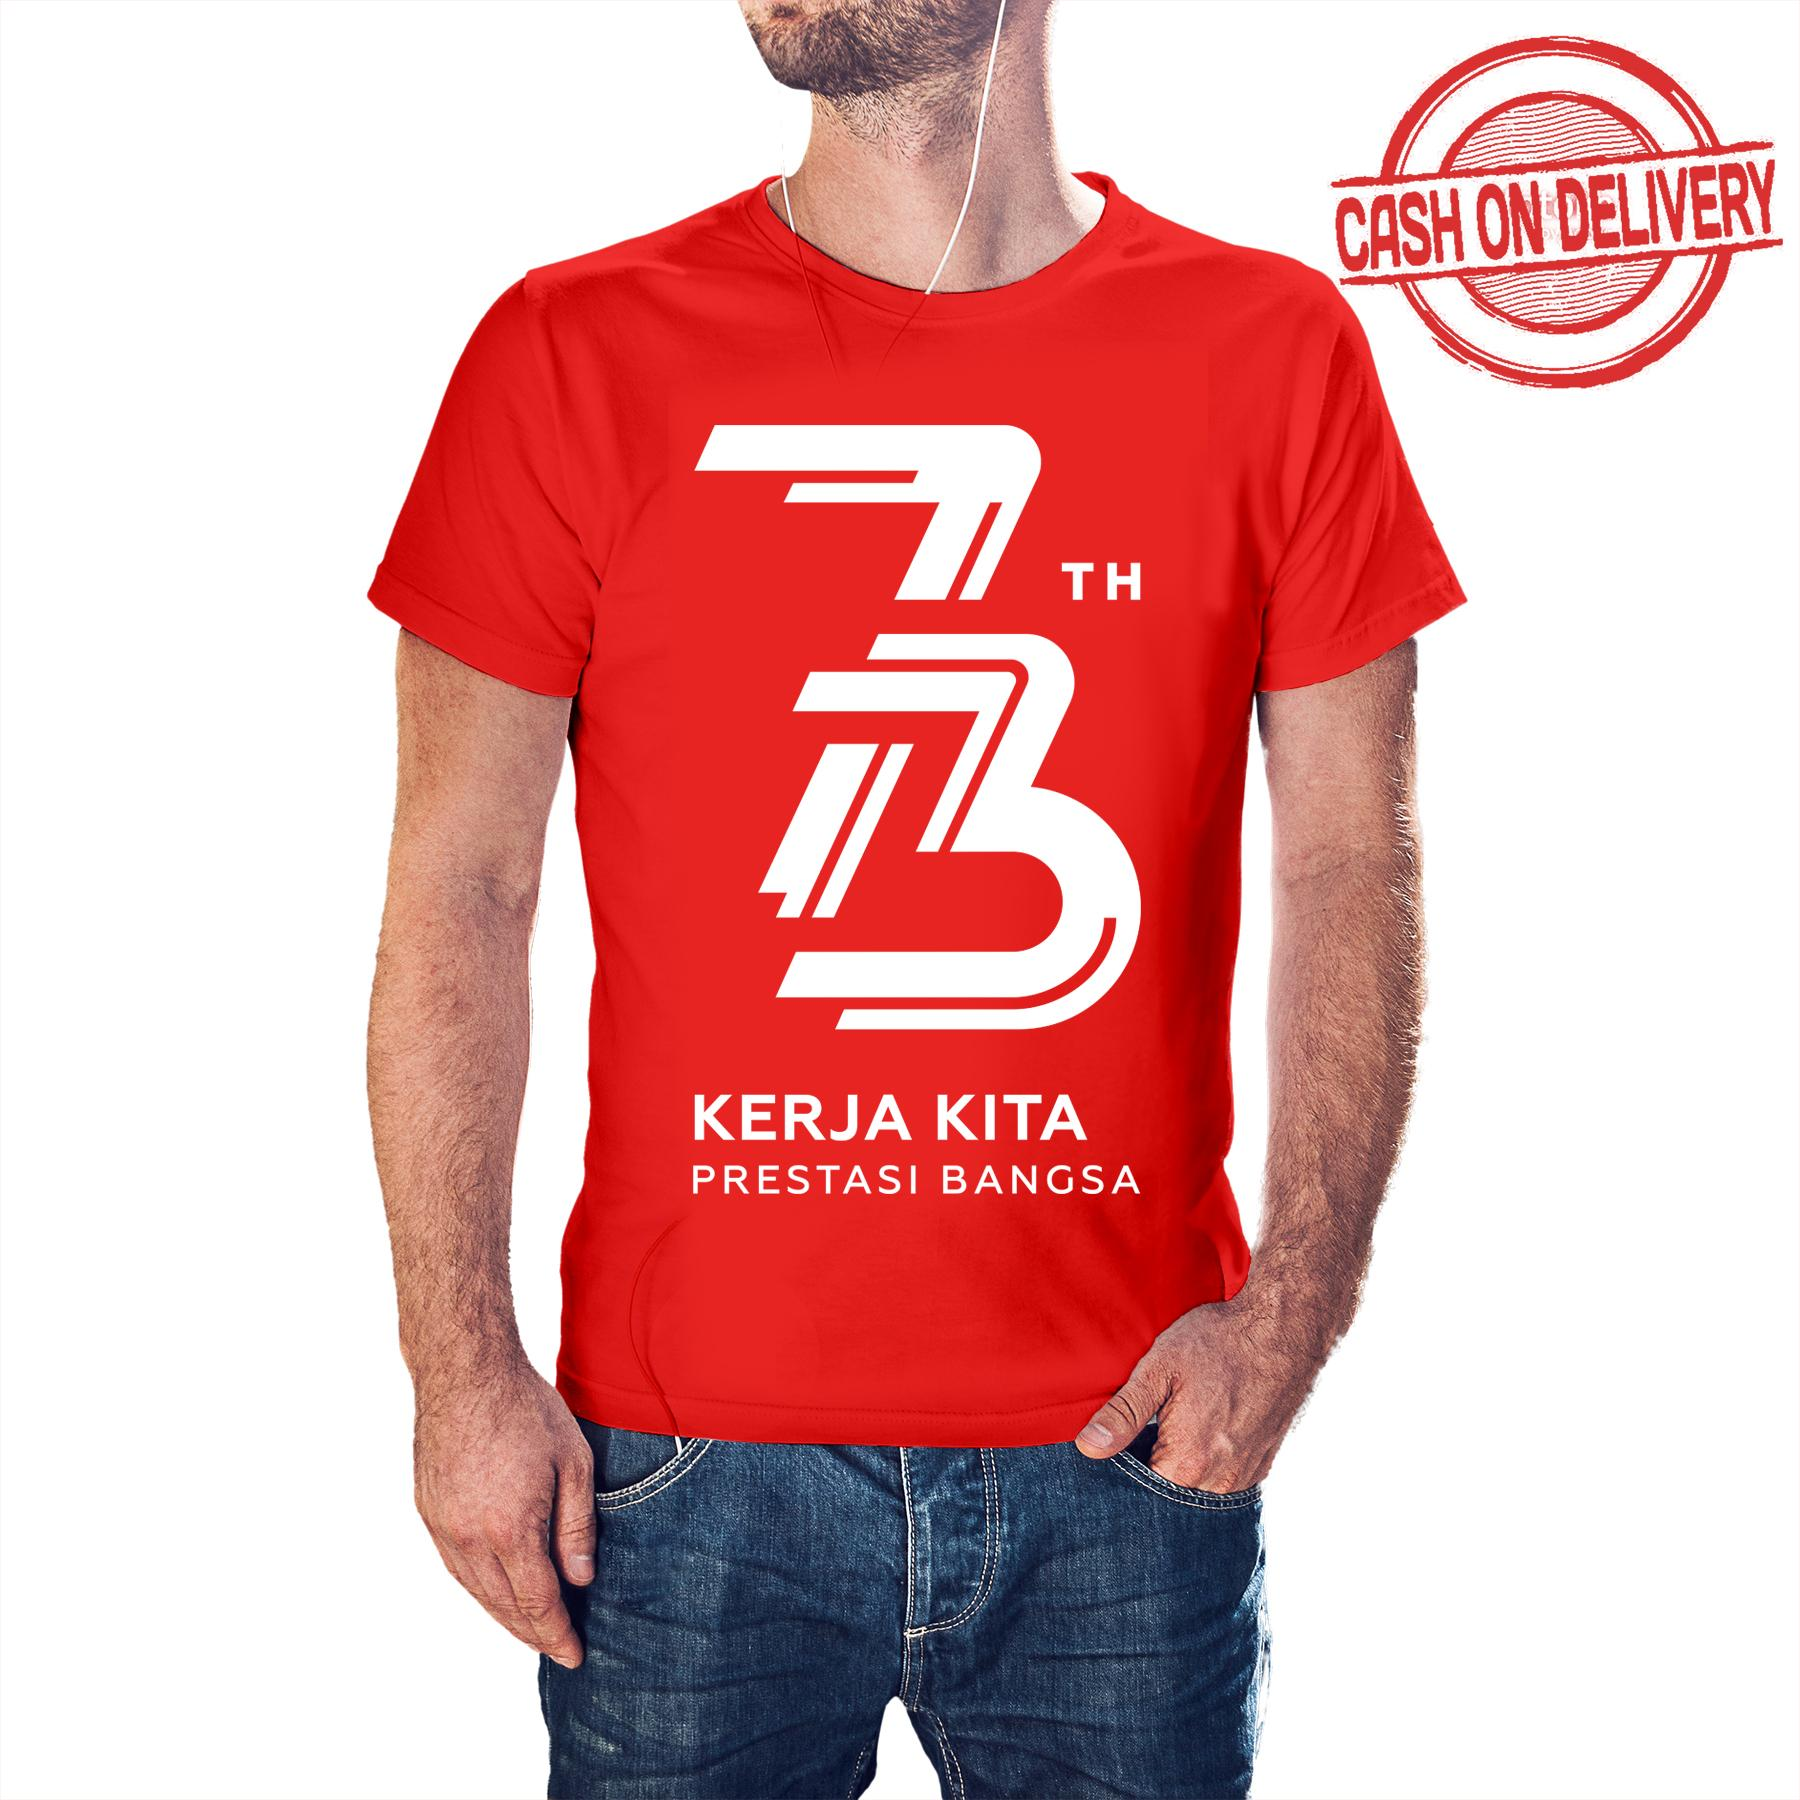 Gudang Fashion Mens Short Sleeve Flannel Shirts Hijau2 Update Celana Tentara Panjang Stretch Loreng Cln 833 Jogger Trousers Hijau Source T Shirt Pria Termodis